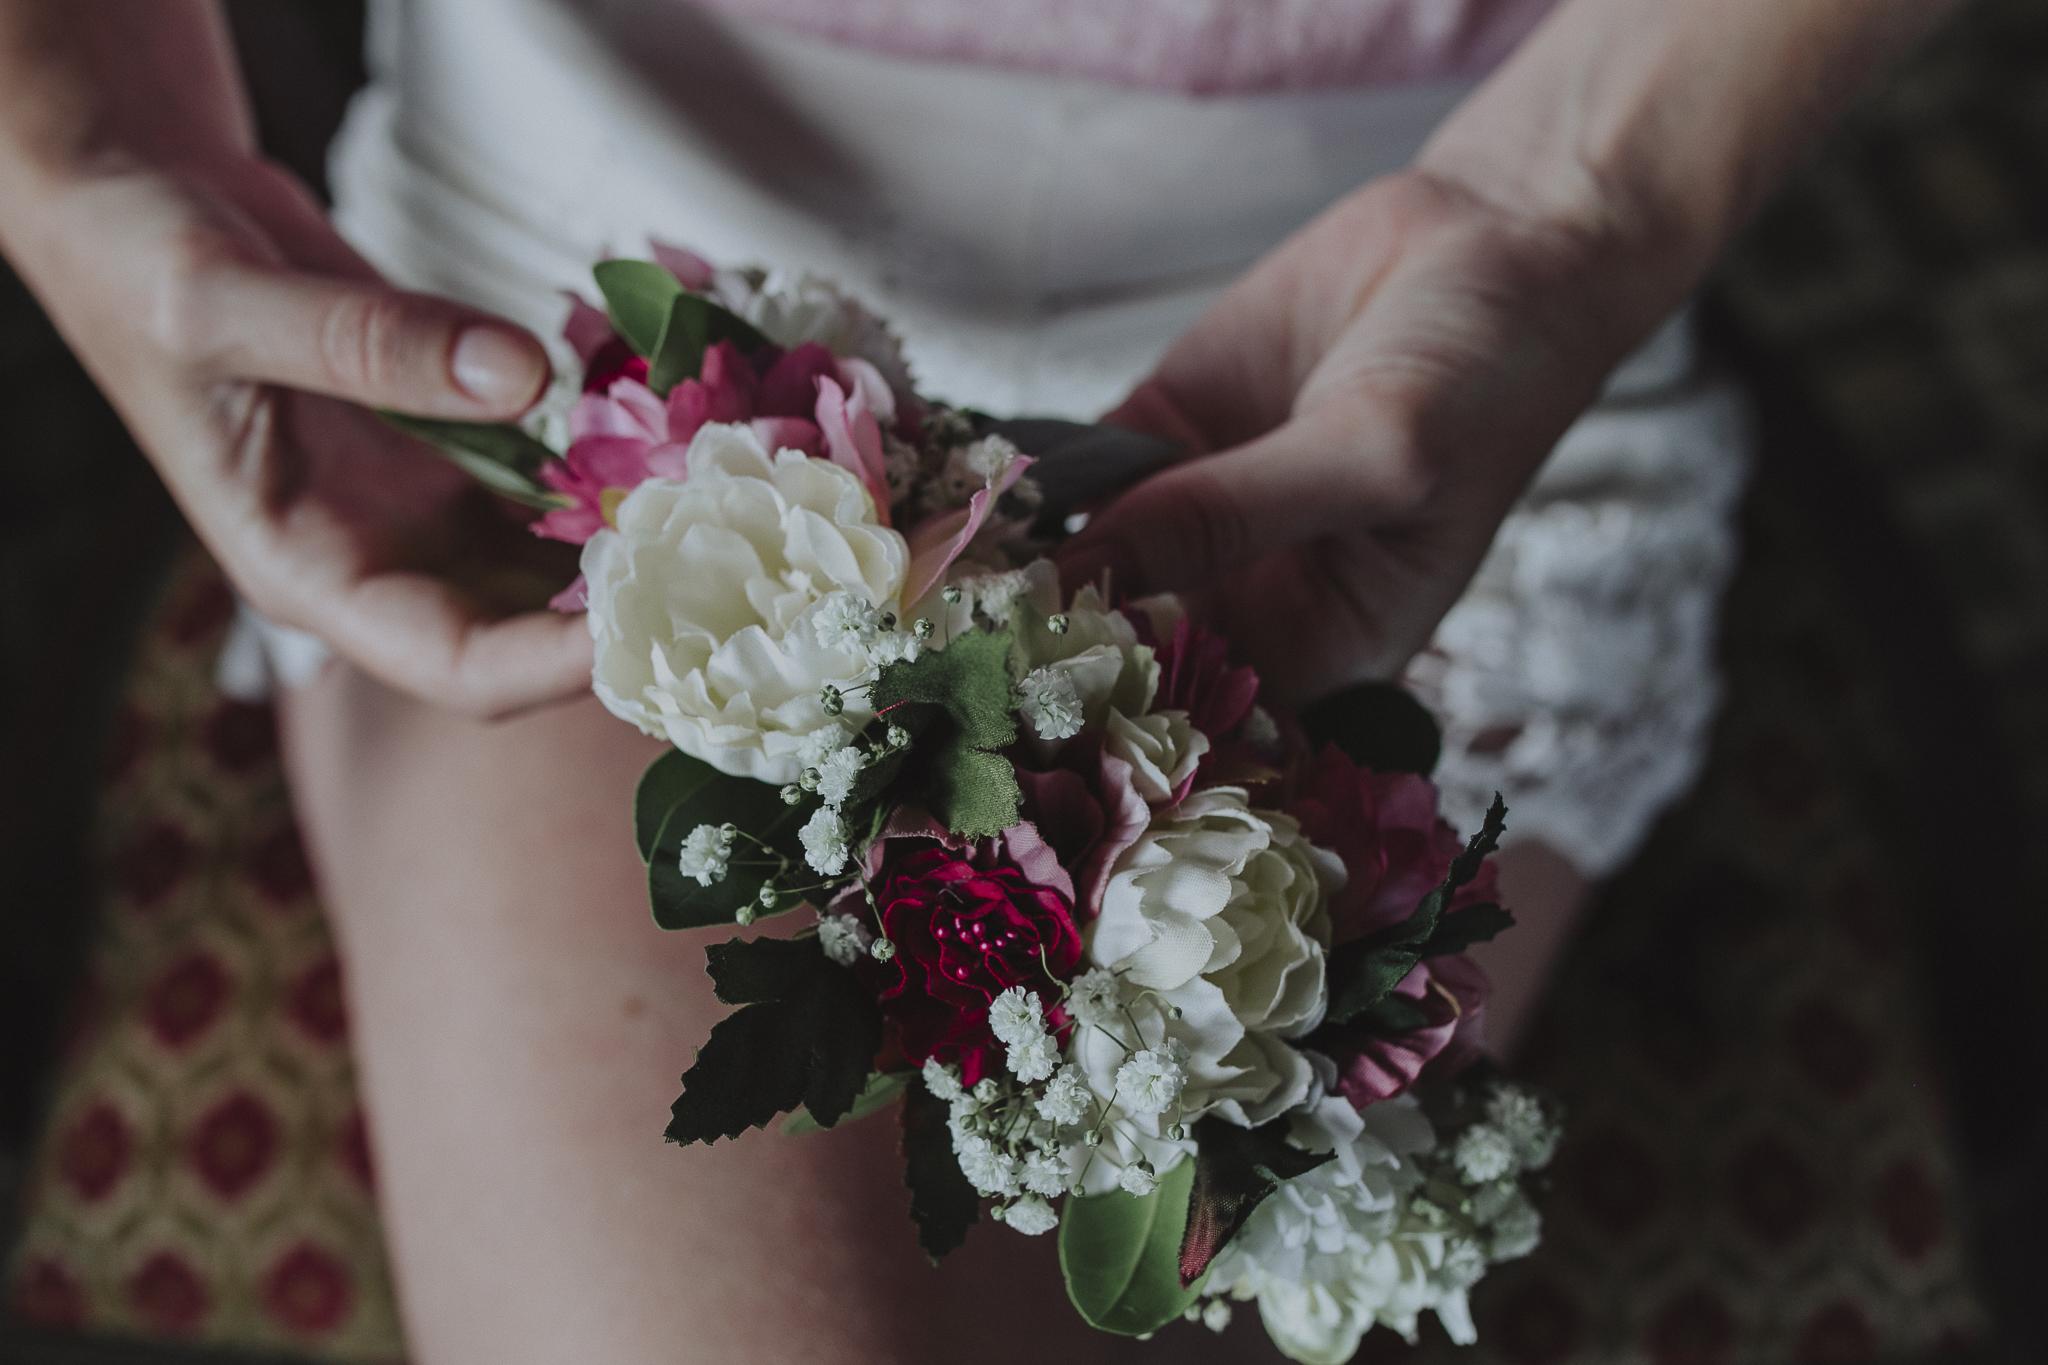 tocado de novia - corona de flores - uruguay - nye